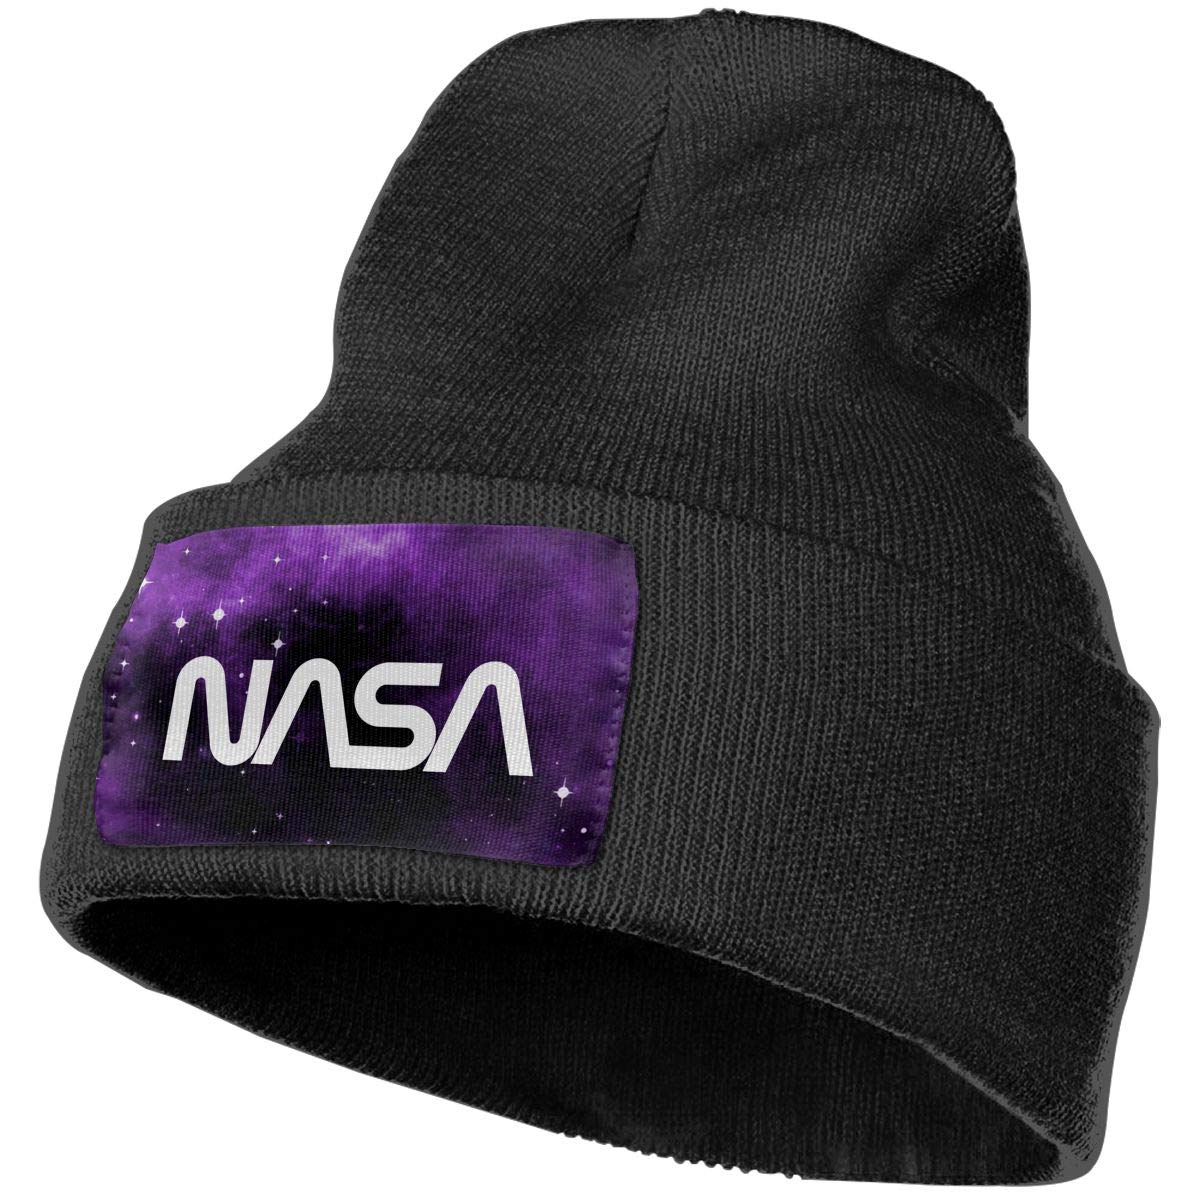 Retro Vintage NASA Winter Beanie Hat Knit Hat Cap for for Men /& Women